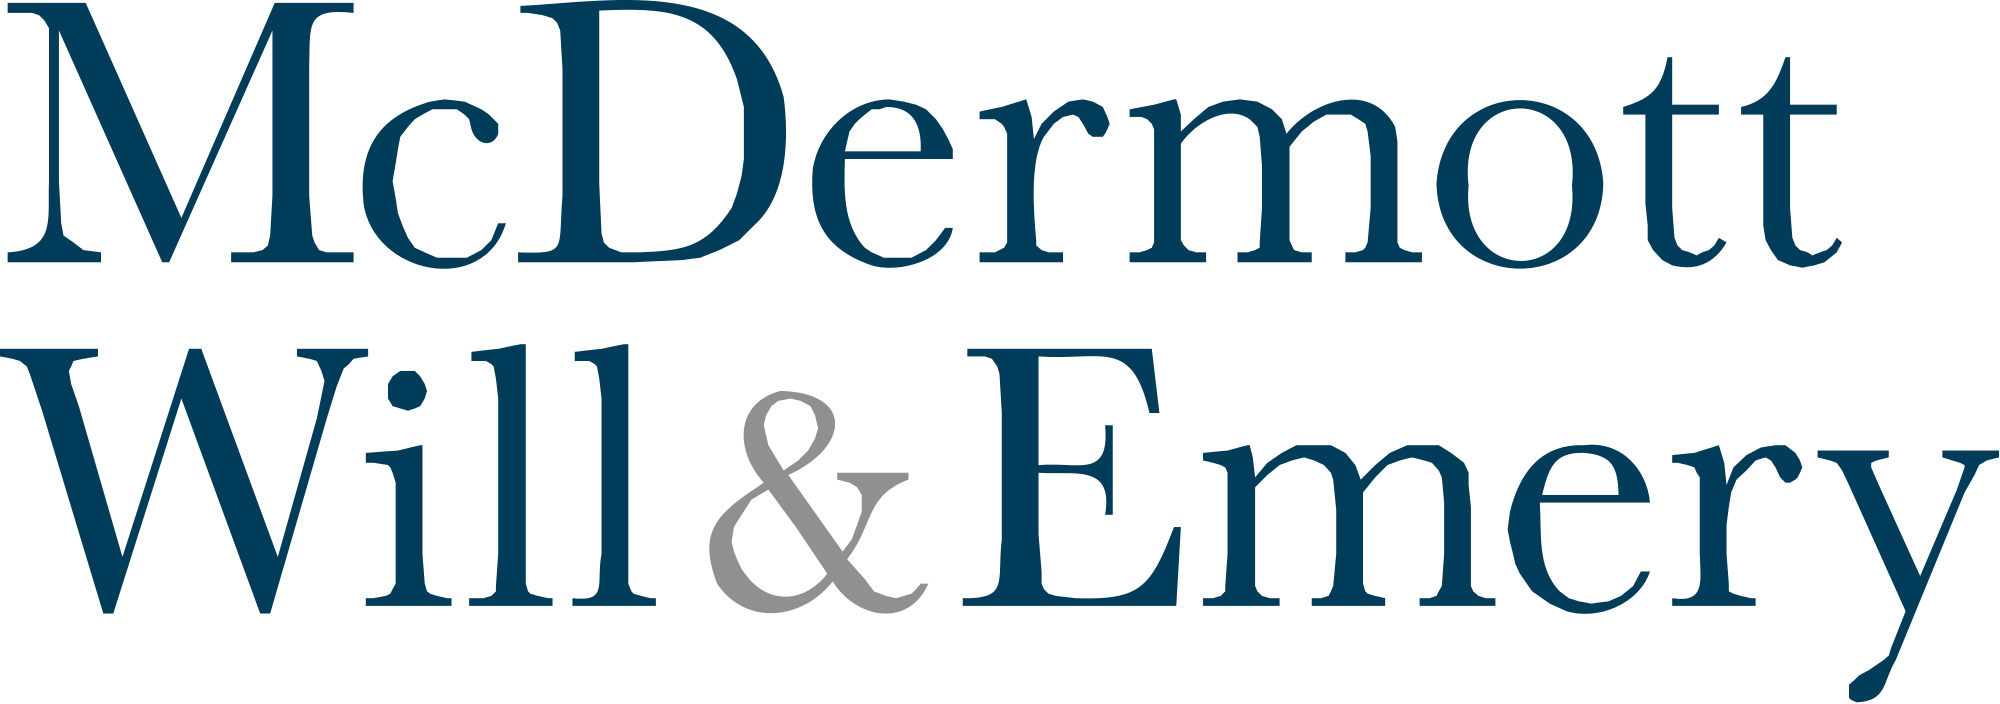 Logo der Kanzlei McDermott, Will & Emery